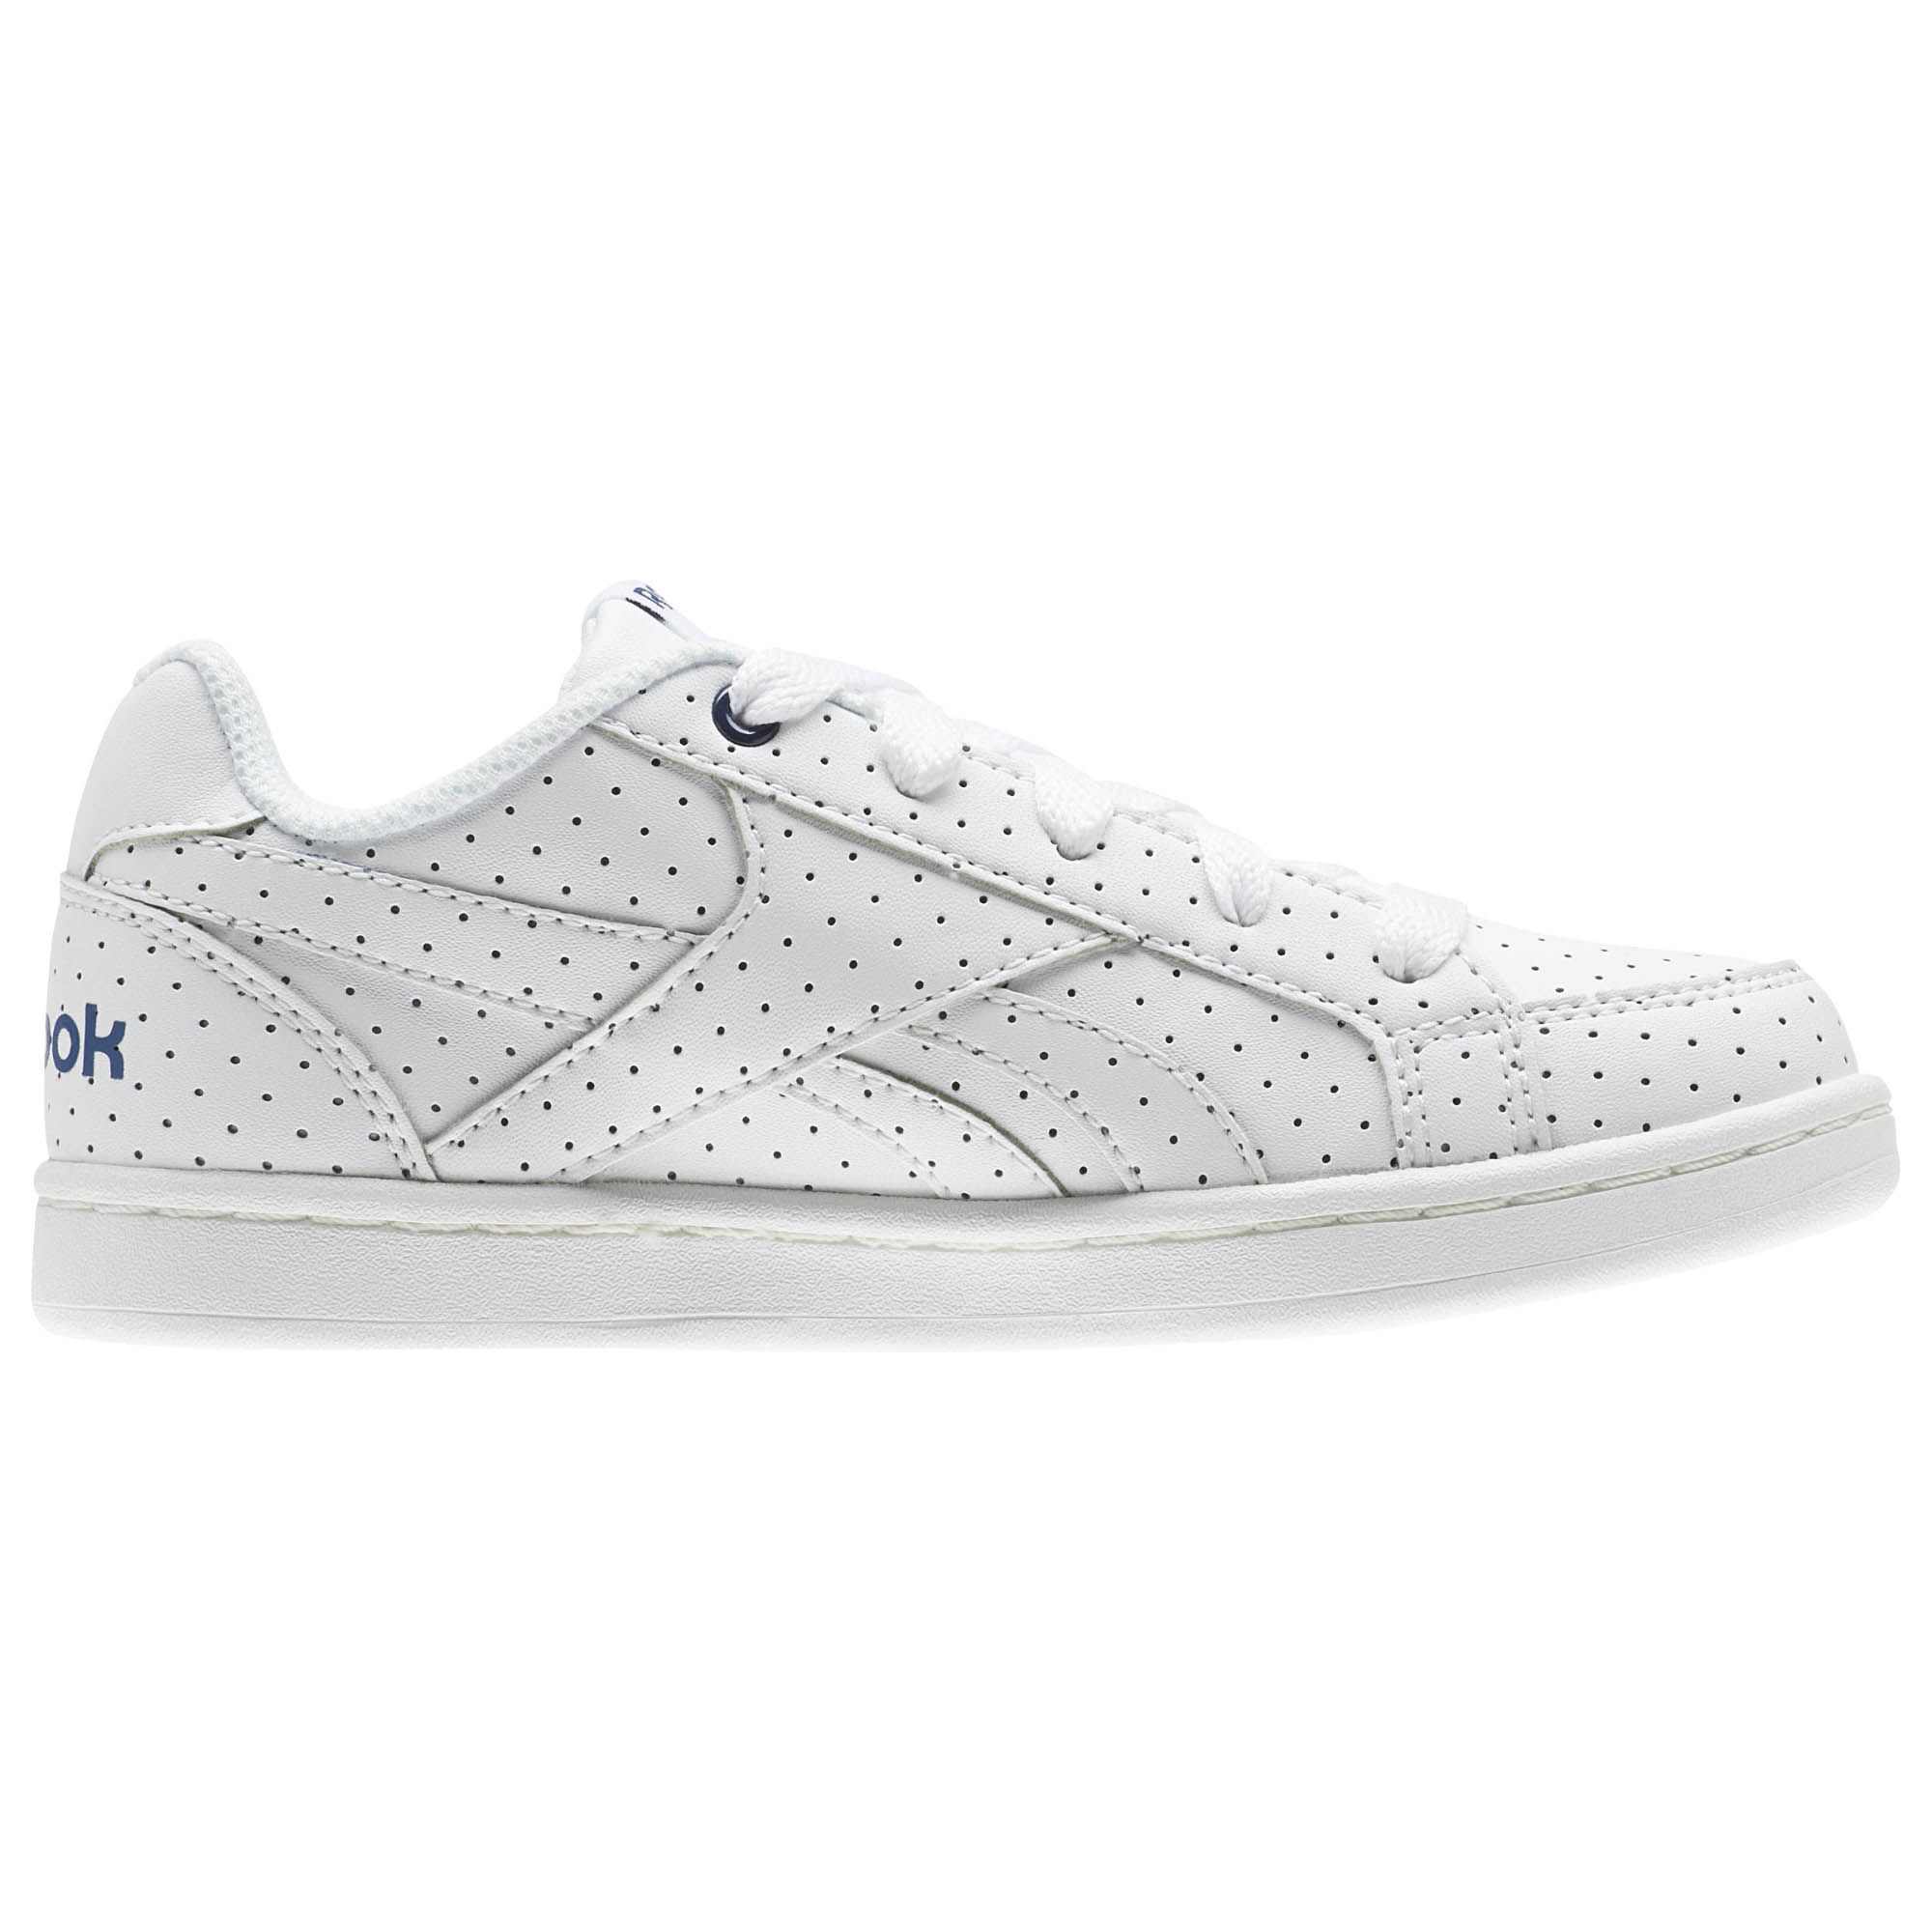 REEBOK Child shoes Unisex REEBOK ROYAL PRIME, free and Time sportwear, White Washed Blue